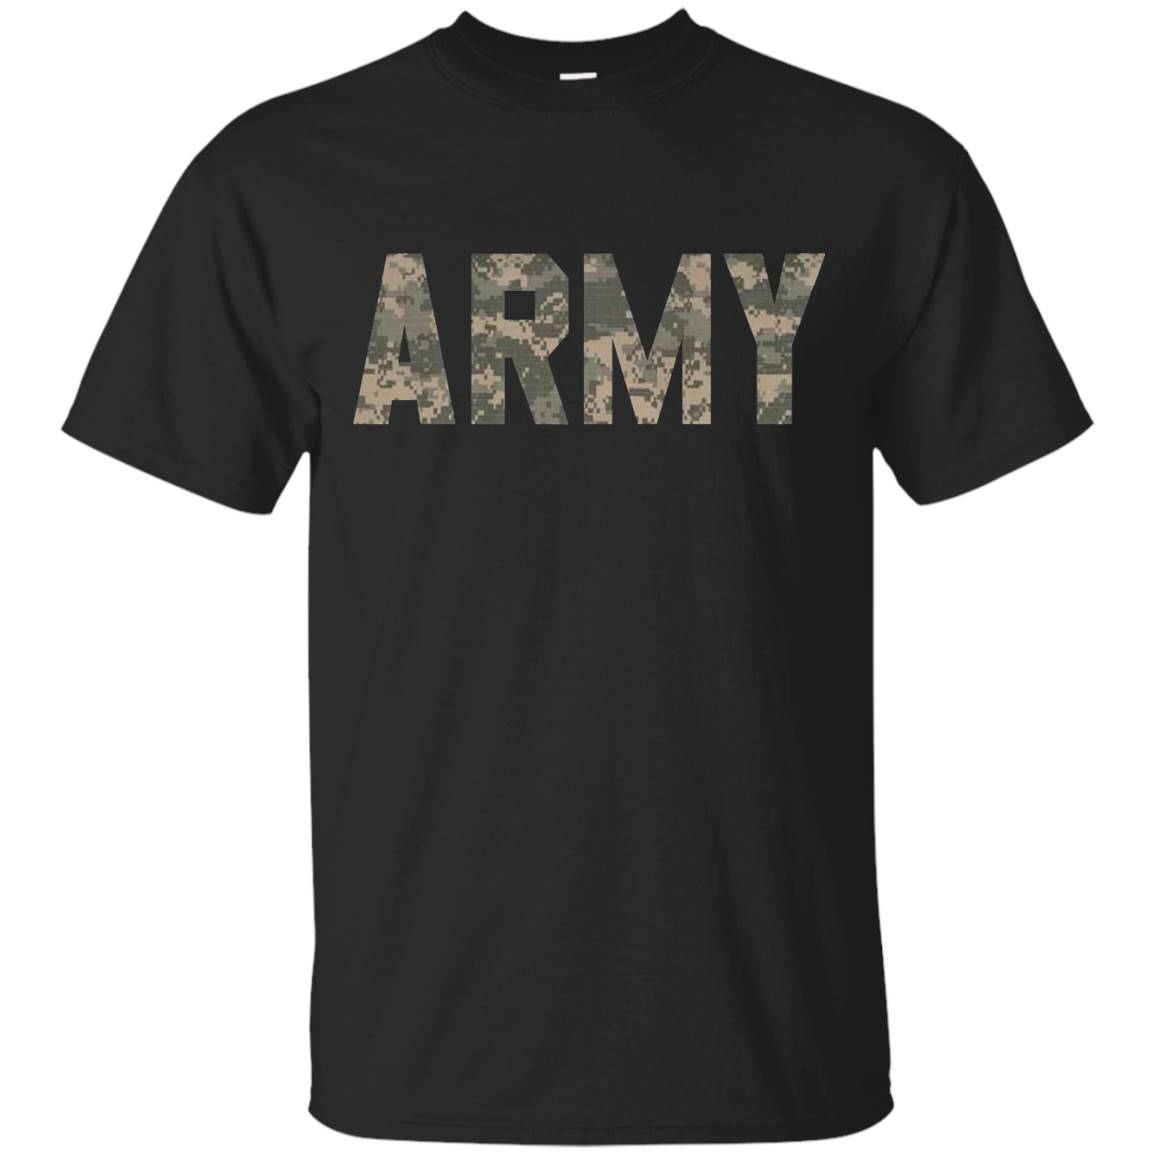 ARMY Digital Camo T-Shirt